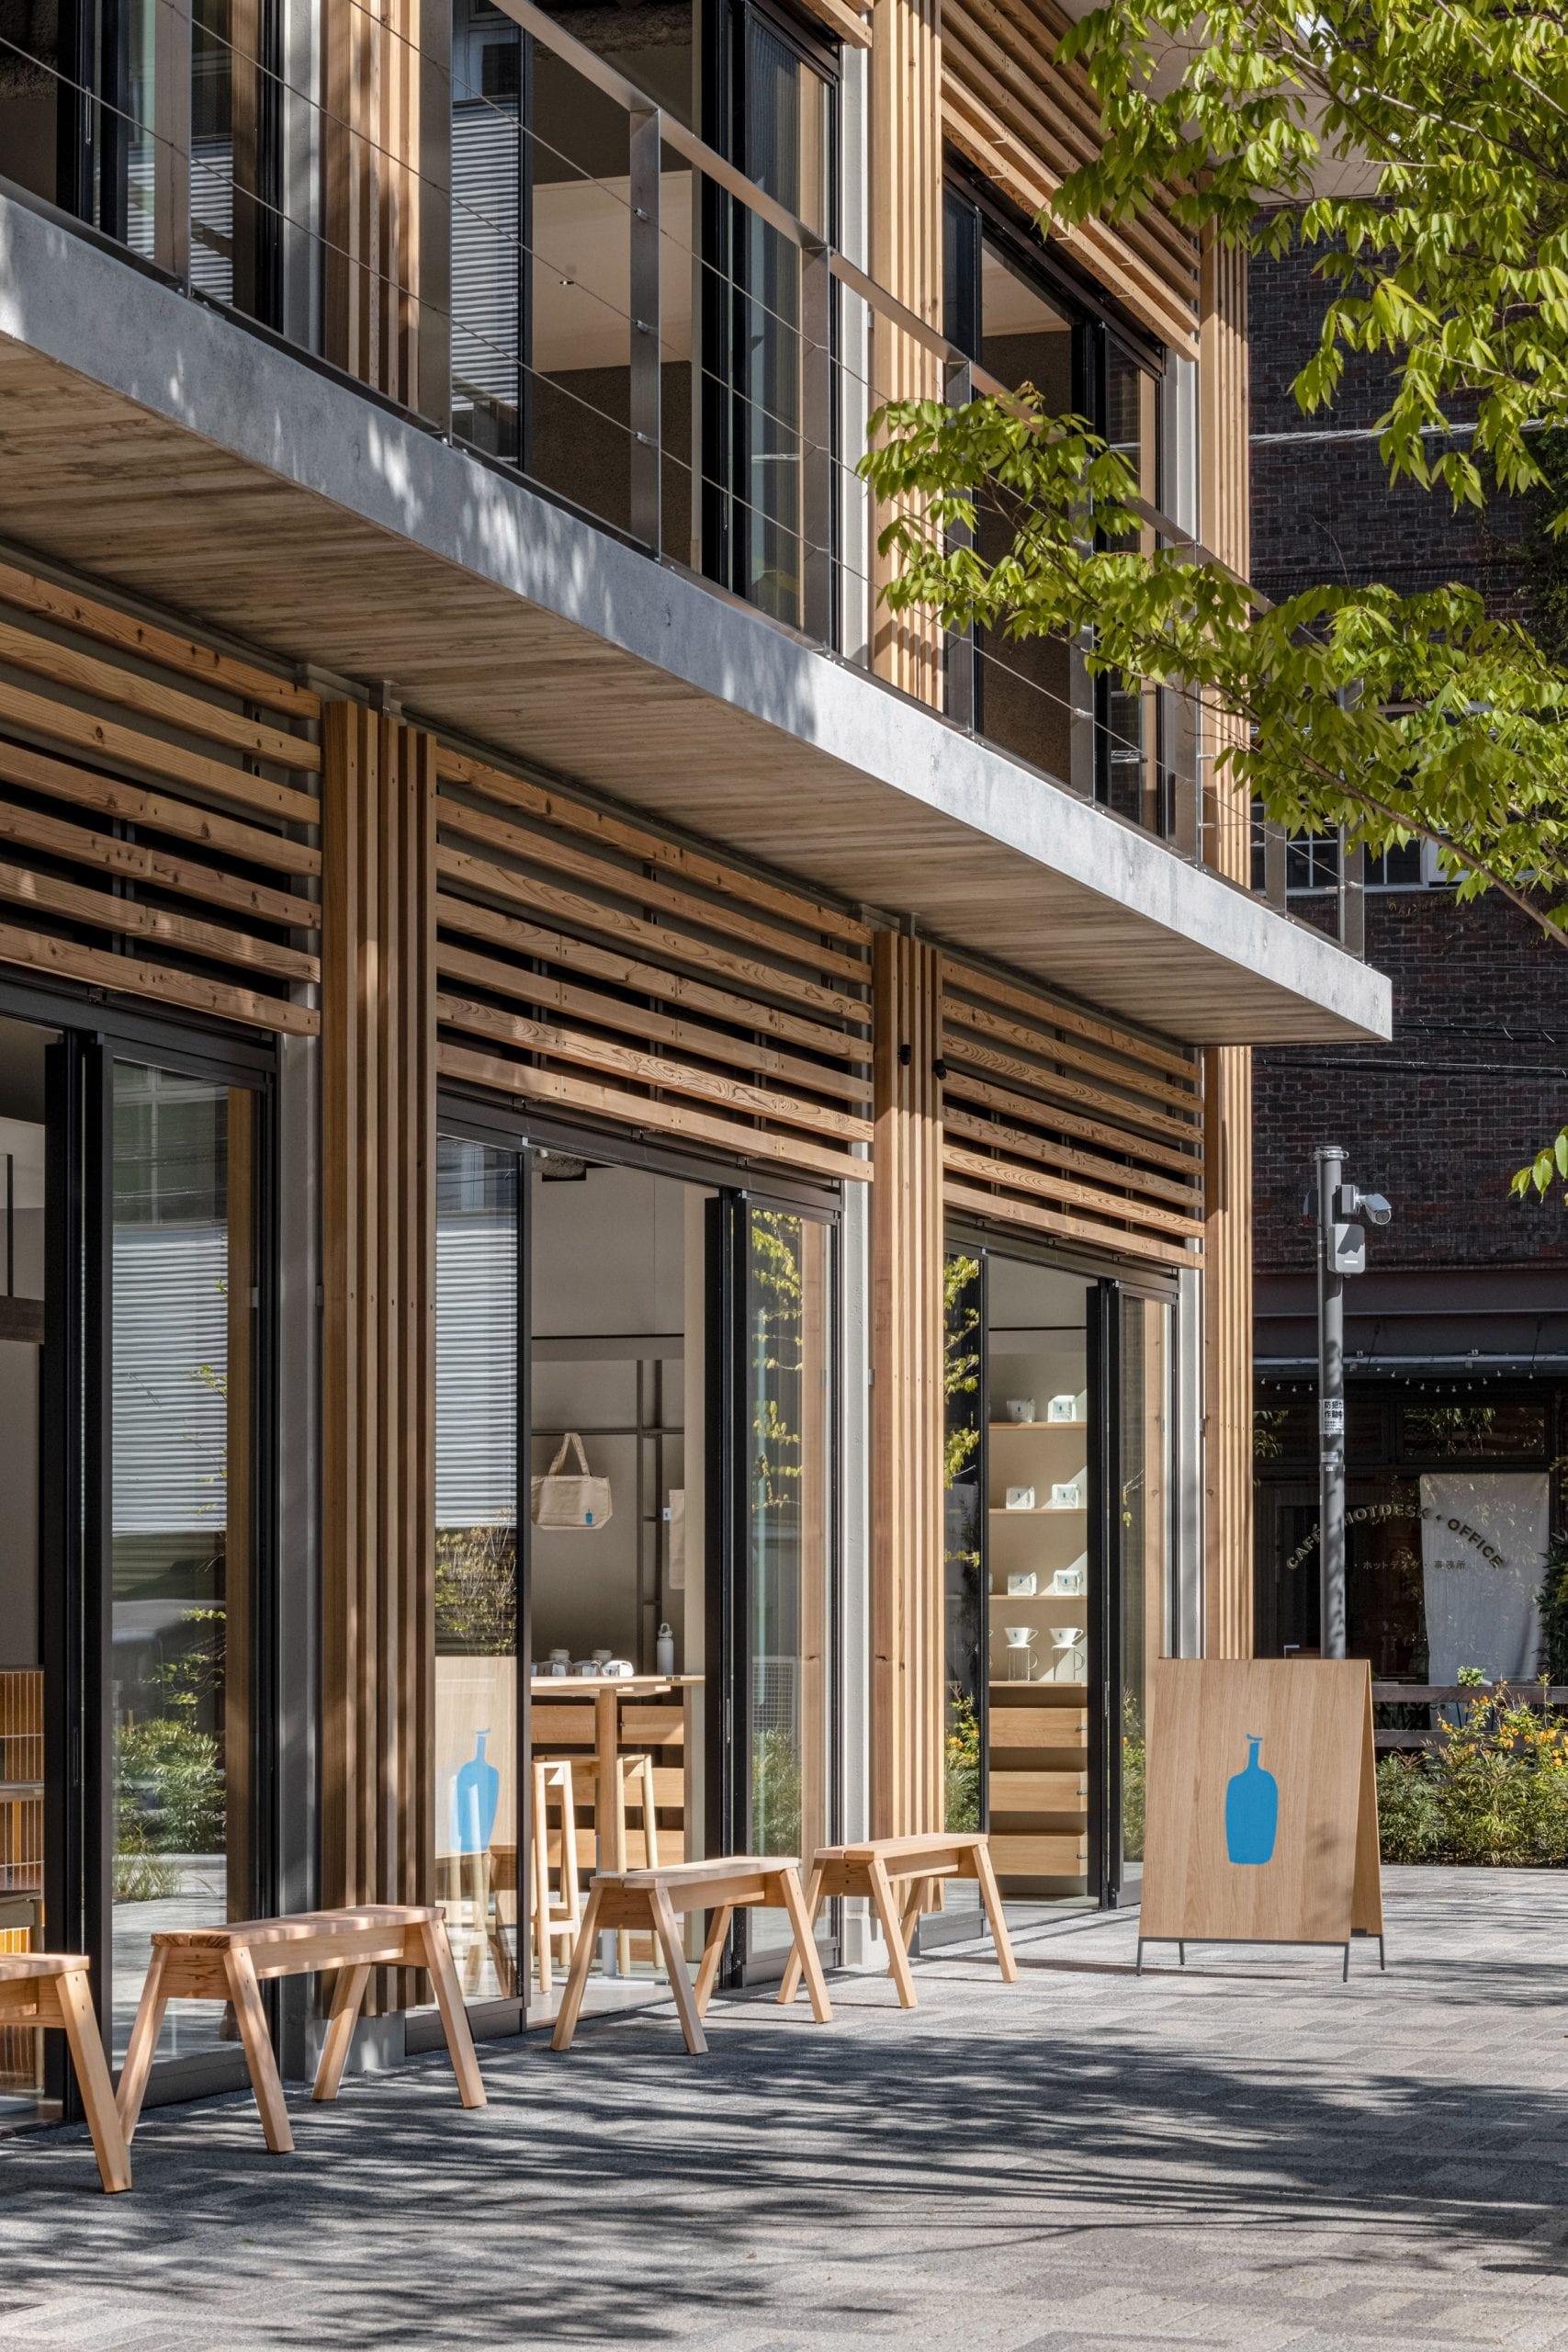 Timber-clad facade of Blue Bottle Coffee Shibuya